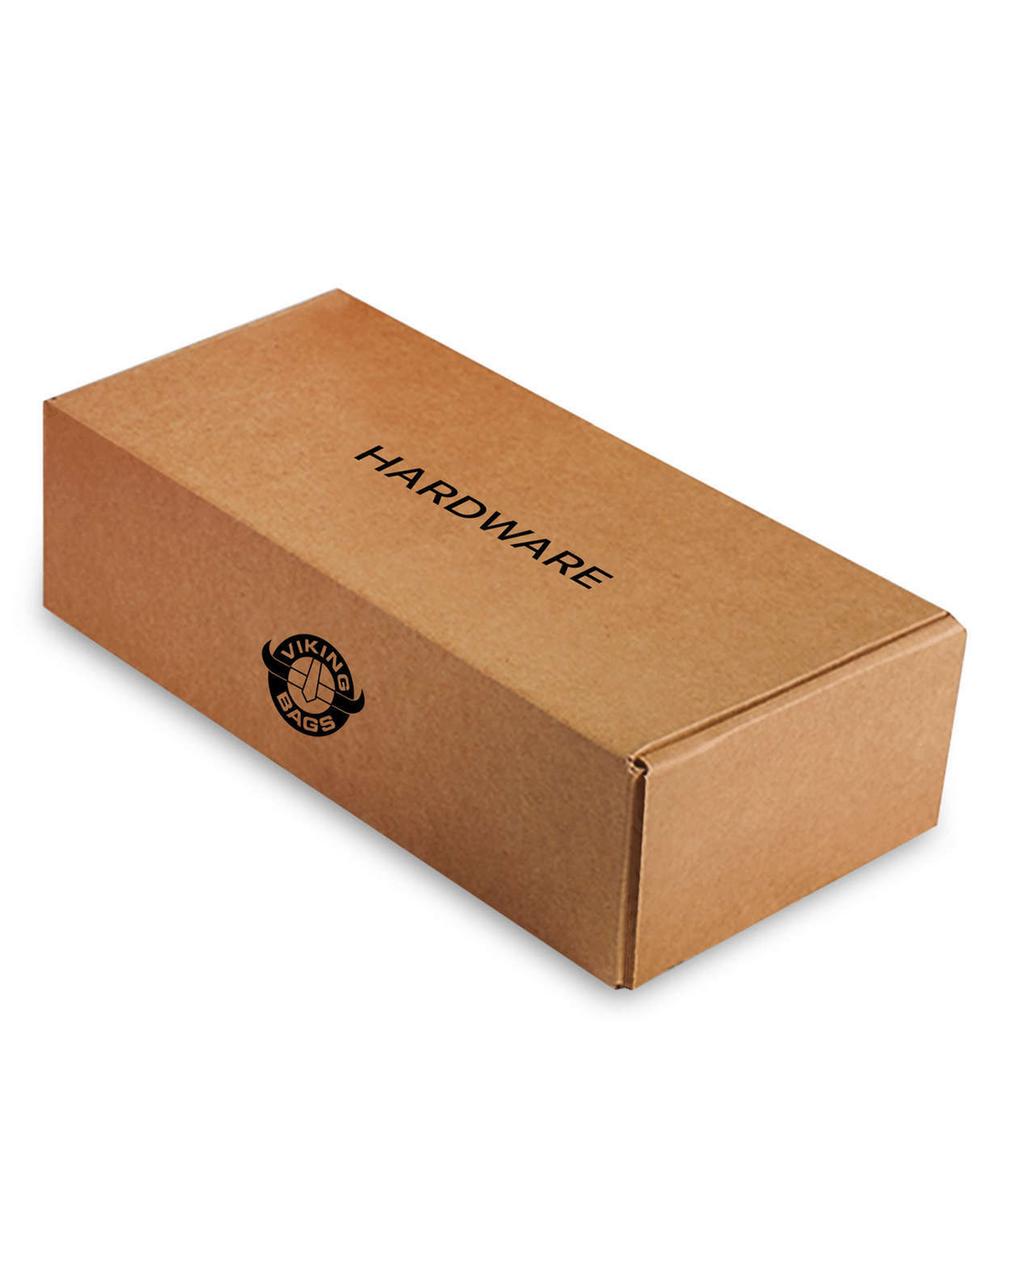 Viking Thor Series Small Motorcycle Saddlebags For Harley Dyna Switchback hardware Box